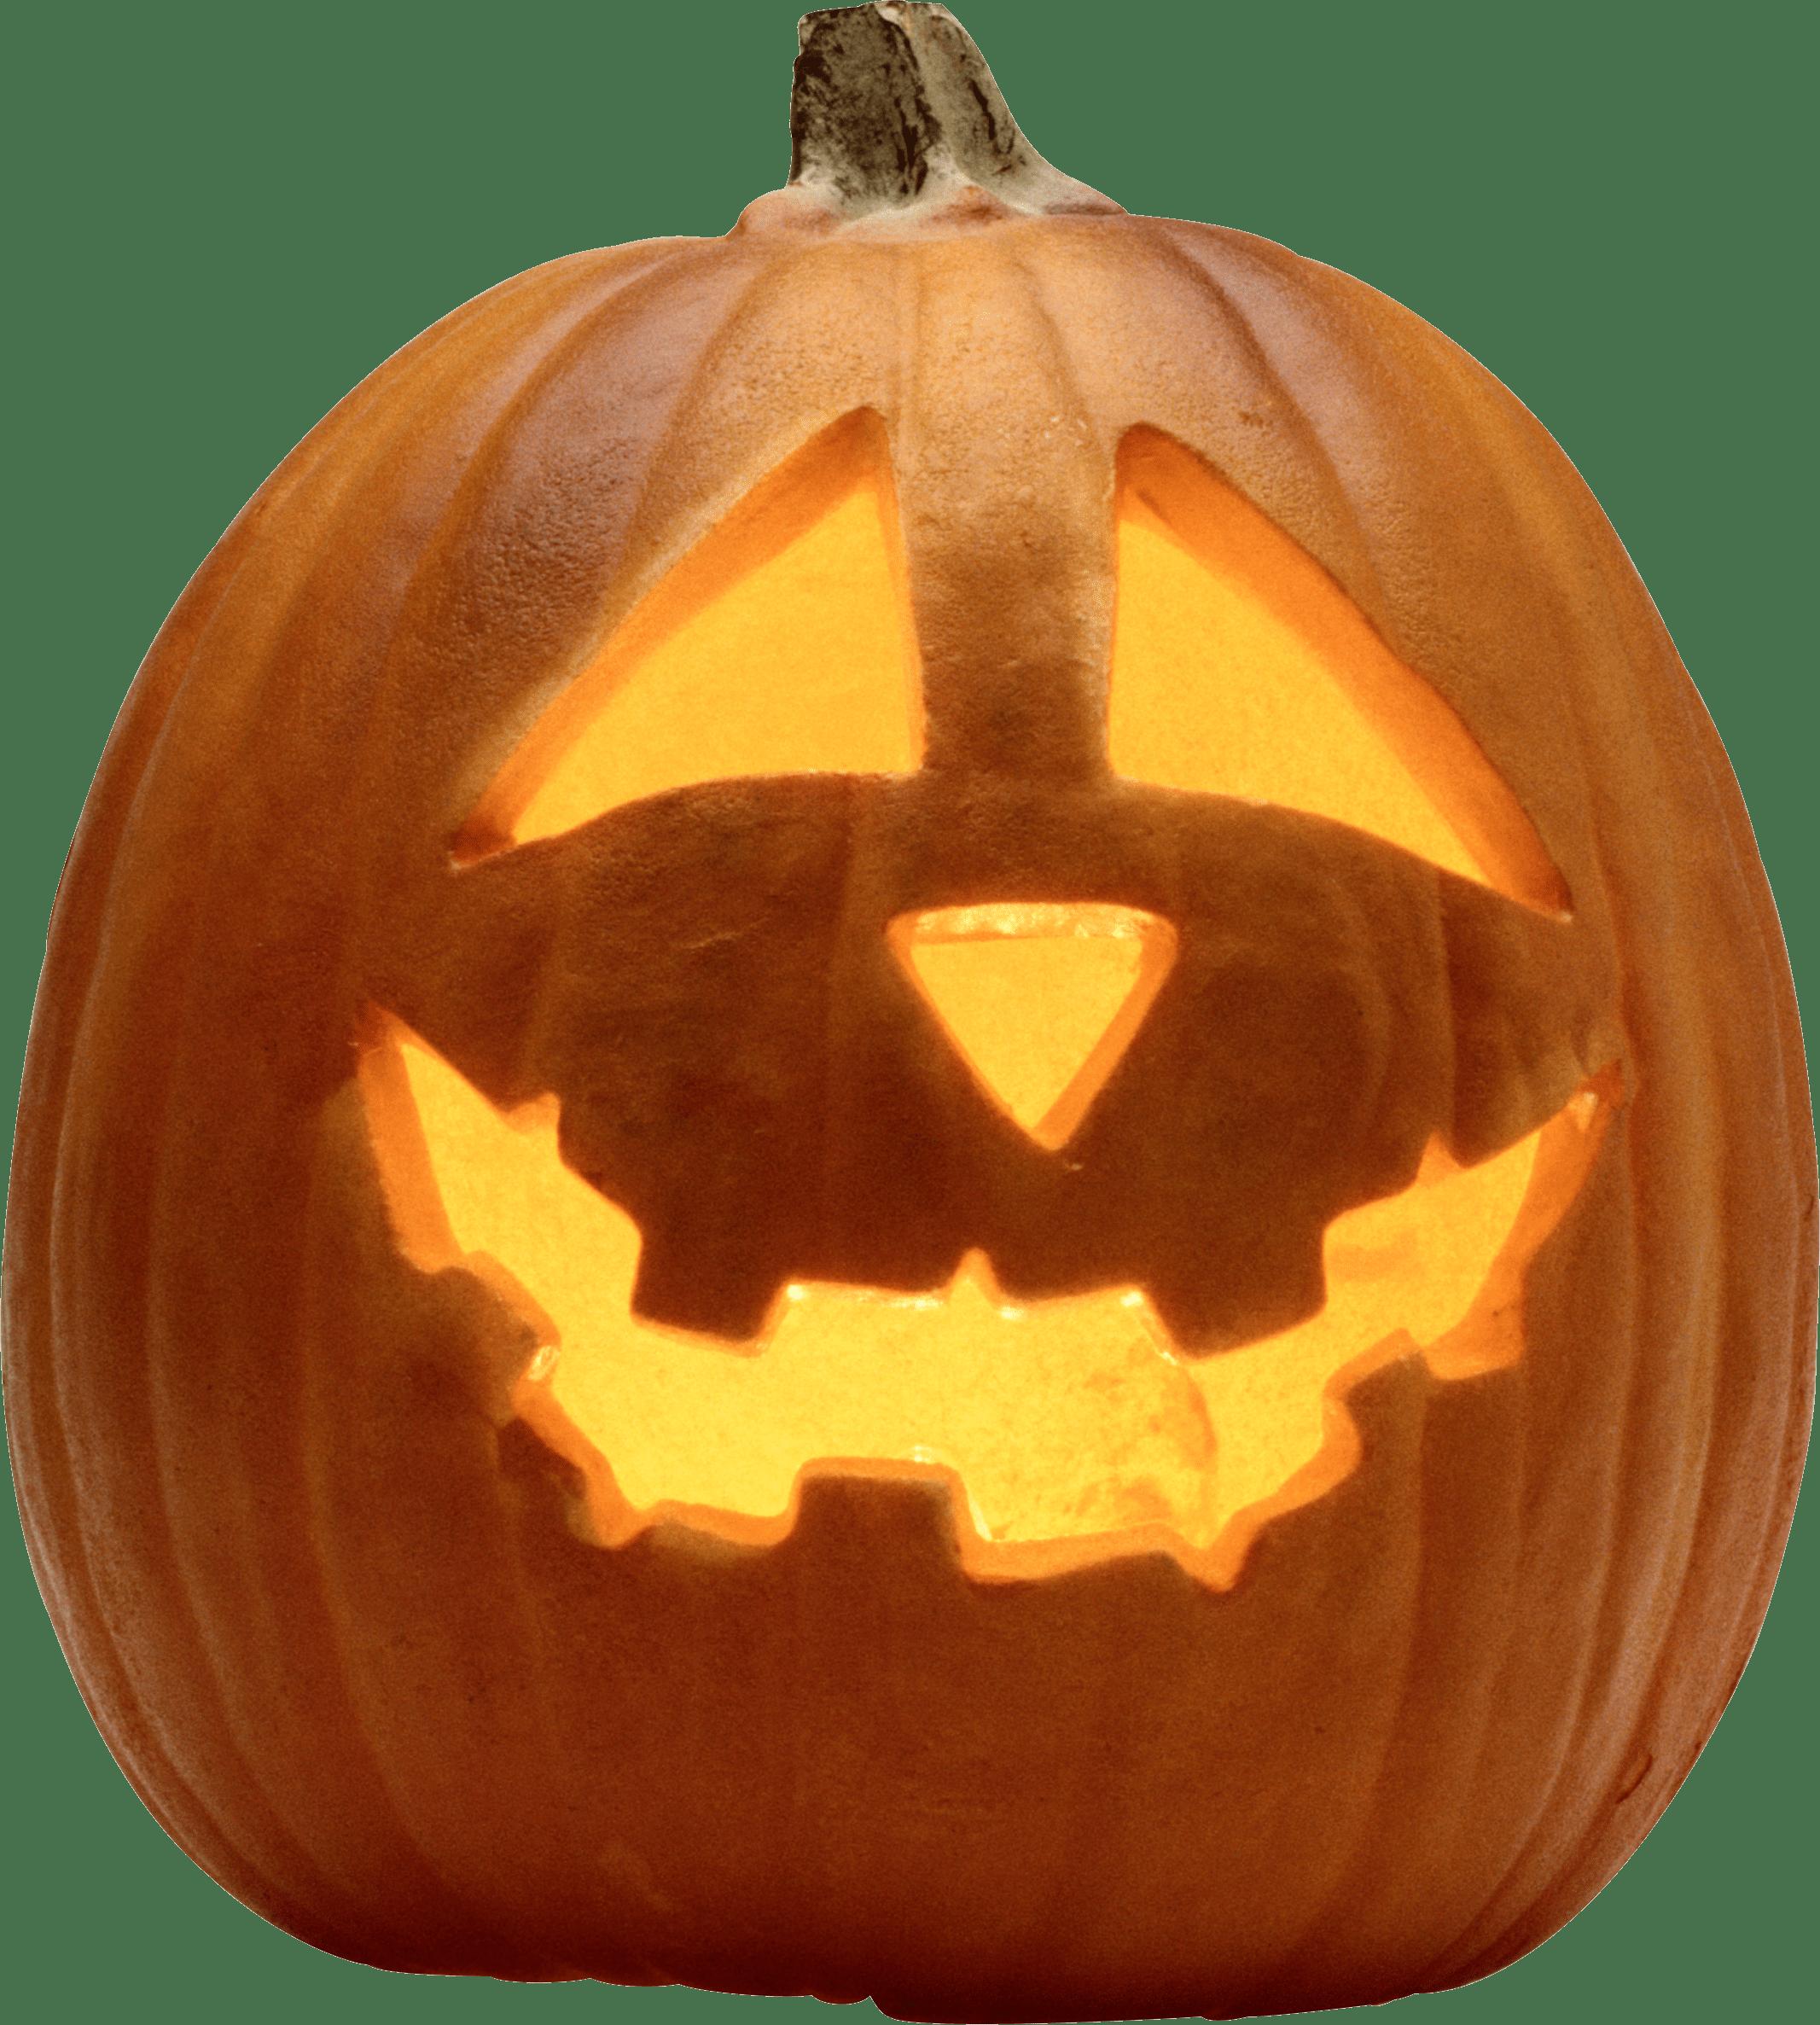 Pumpkin png clipart for photoshop clipart transparent download halloween pumpkin png - Free PNG Images | TOPpng clipart transparent download